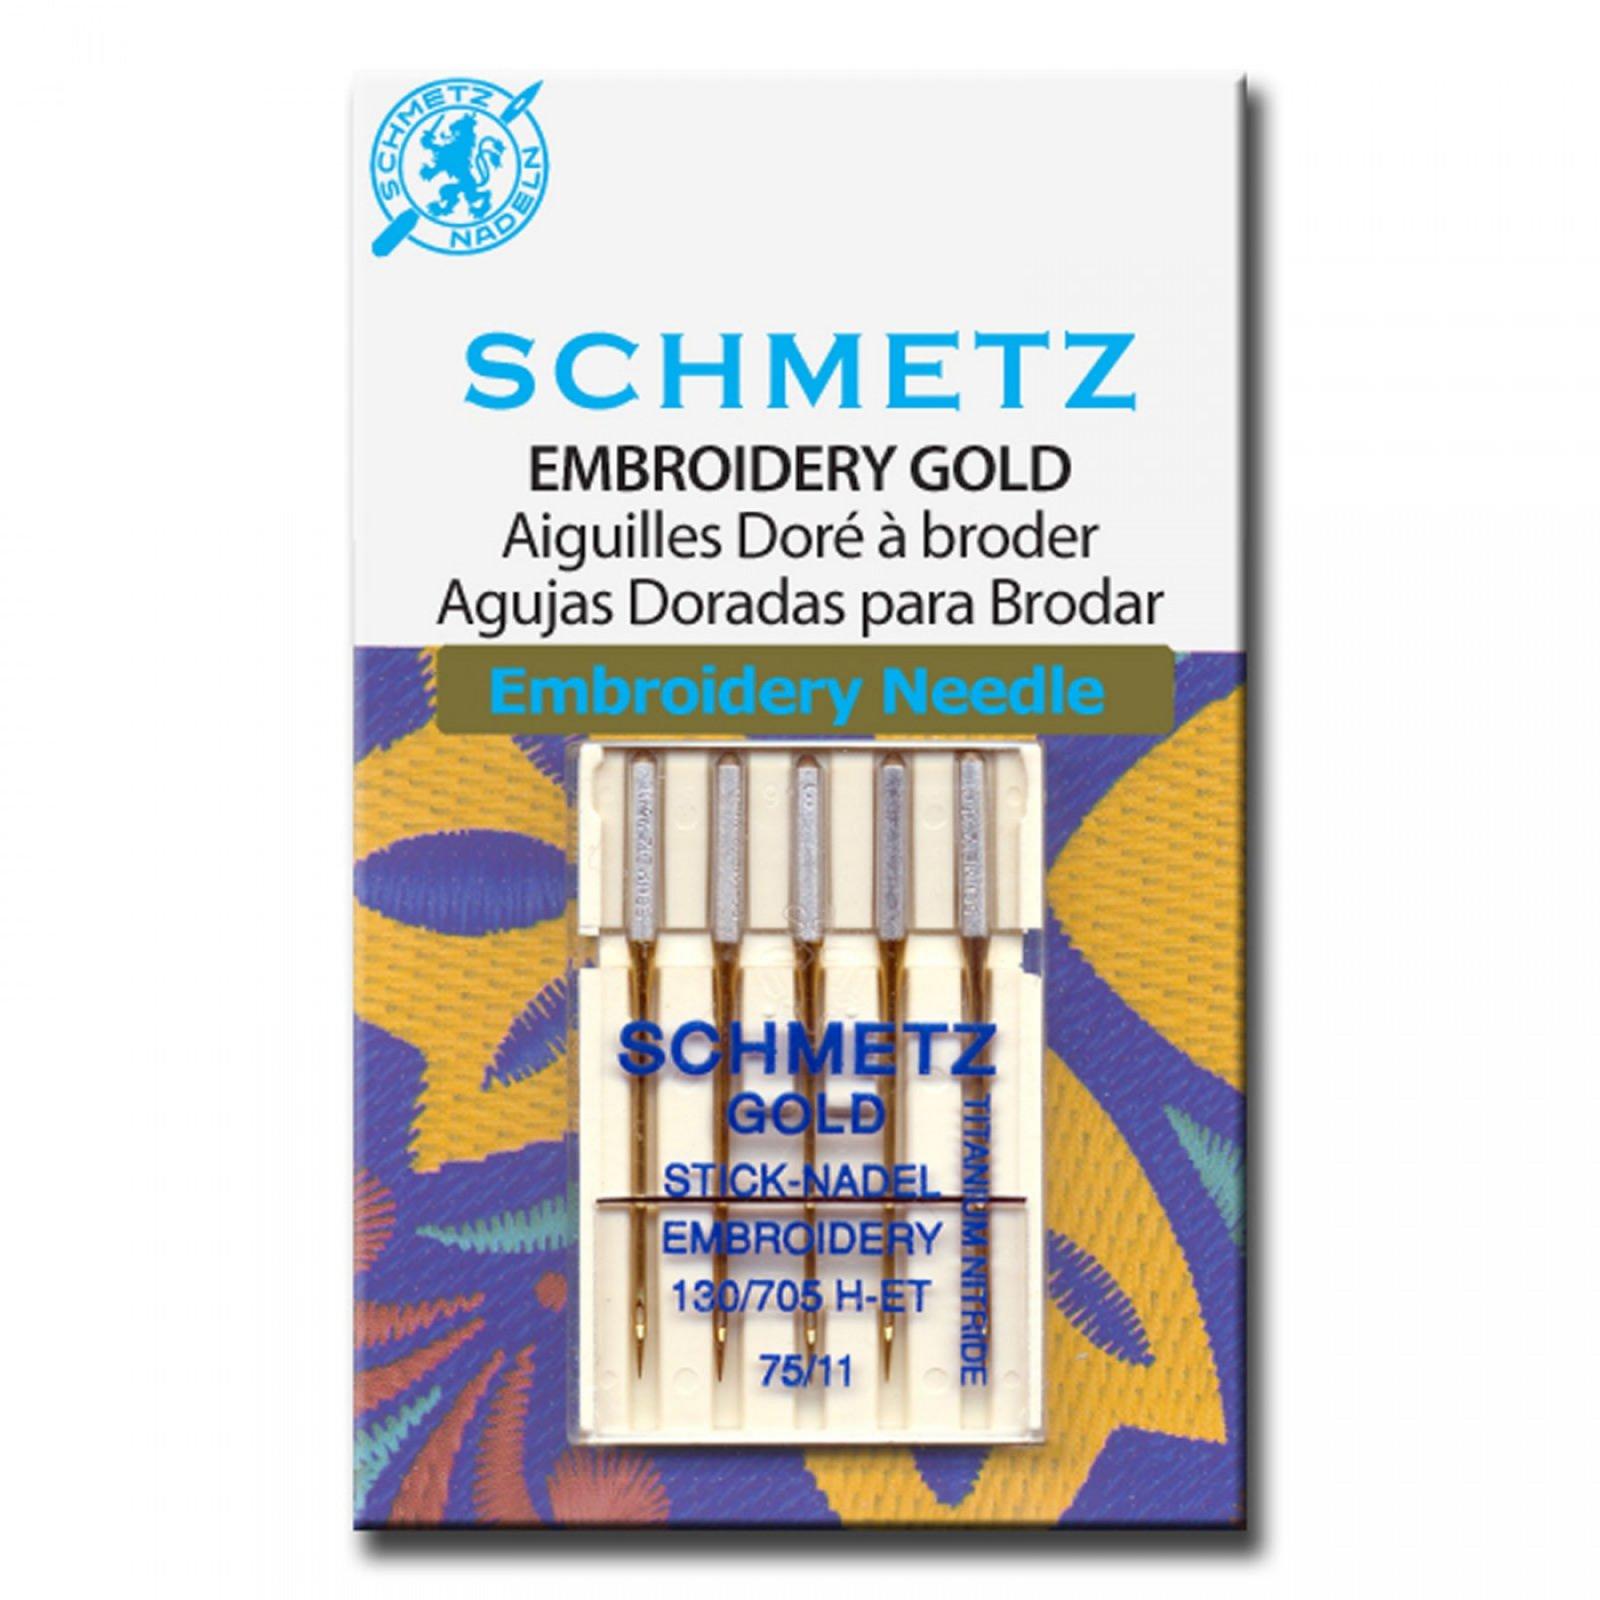 Schmetz Gold Embroidery Machine Needle 11/75